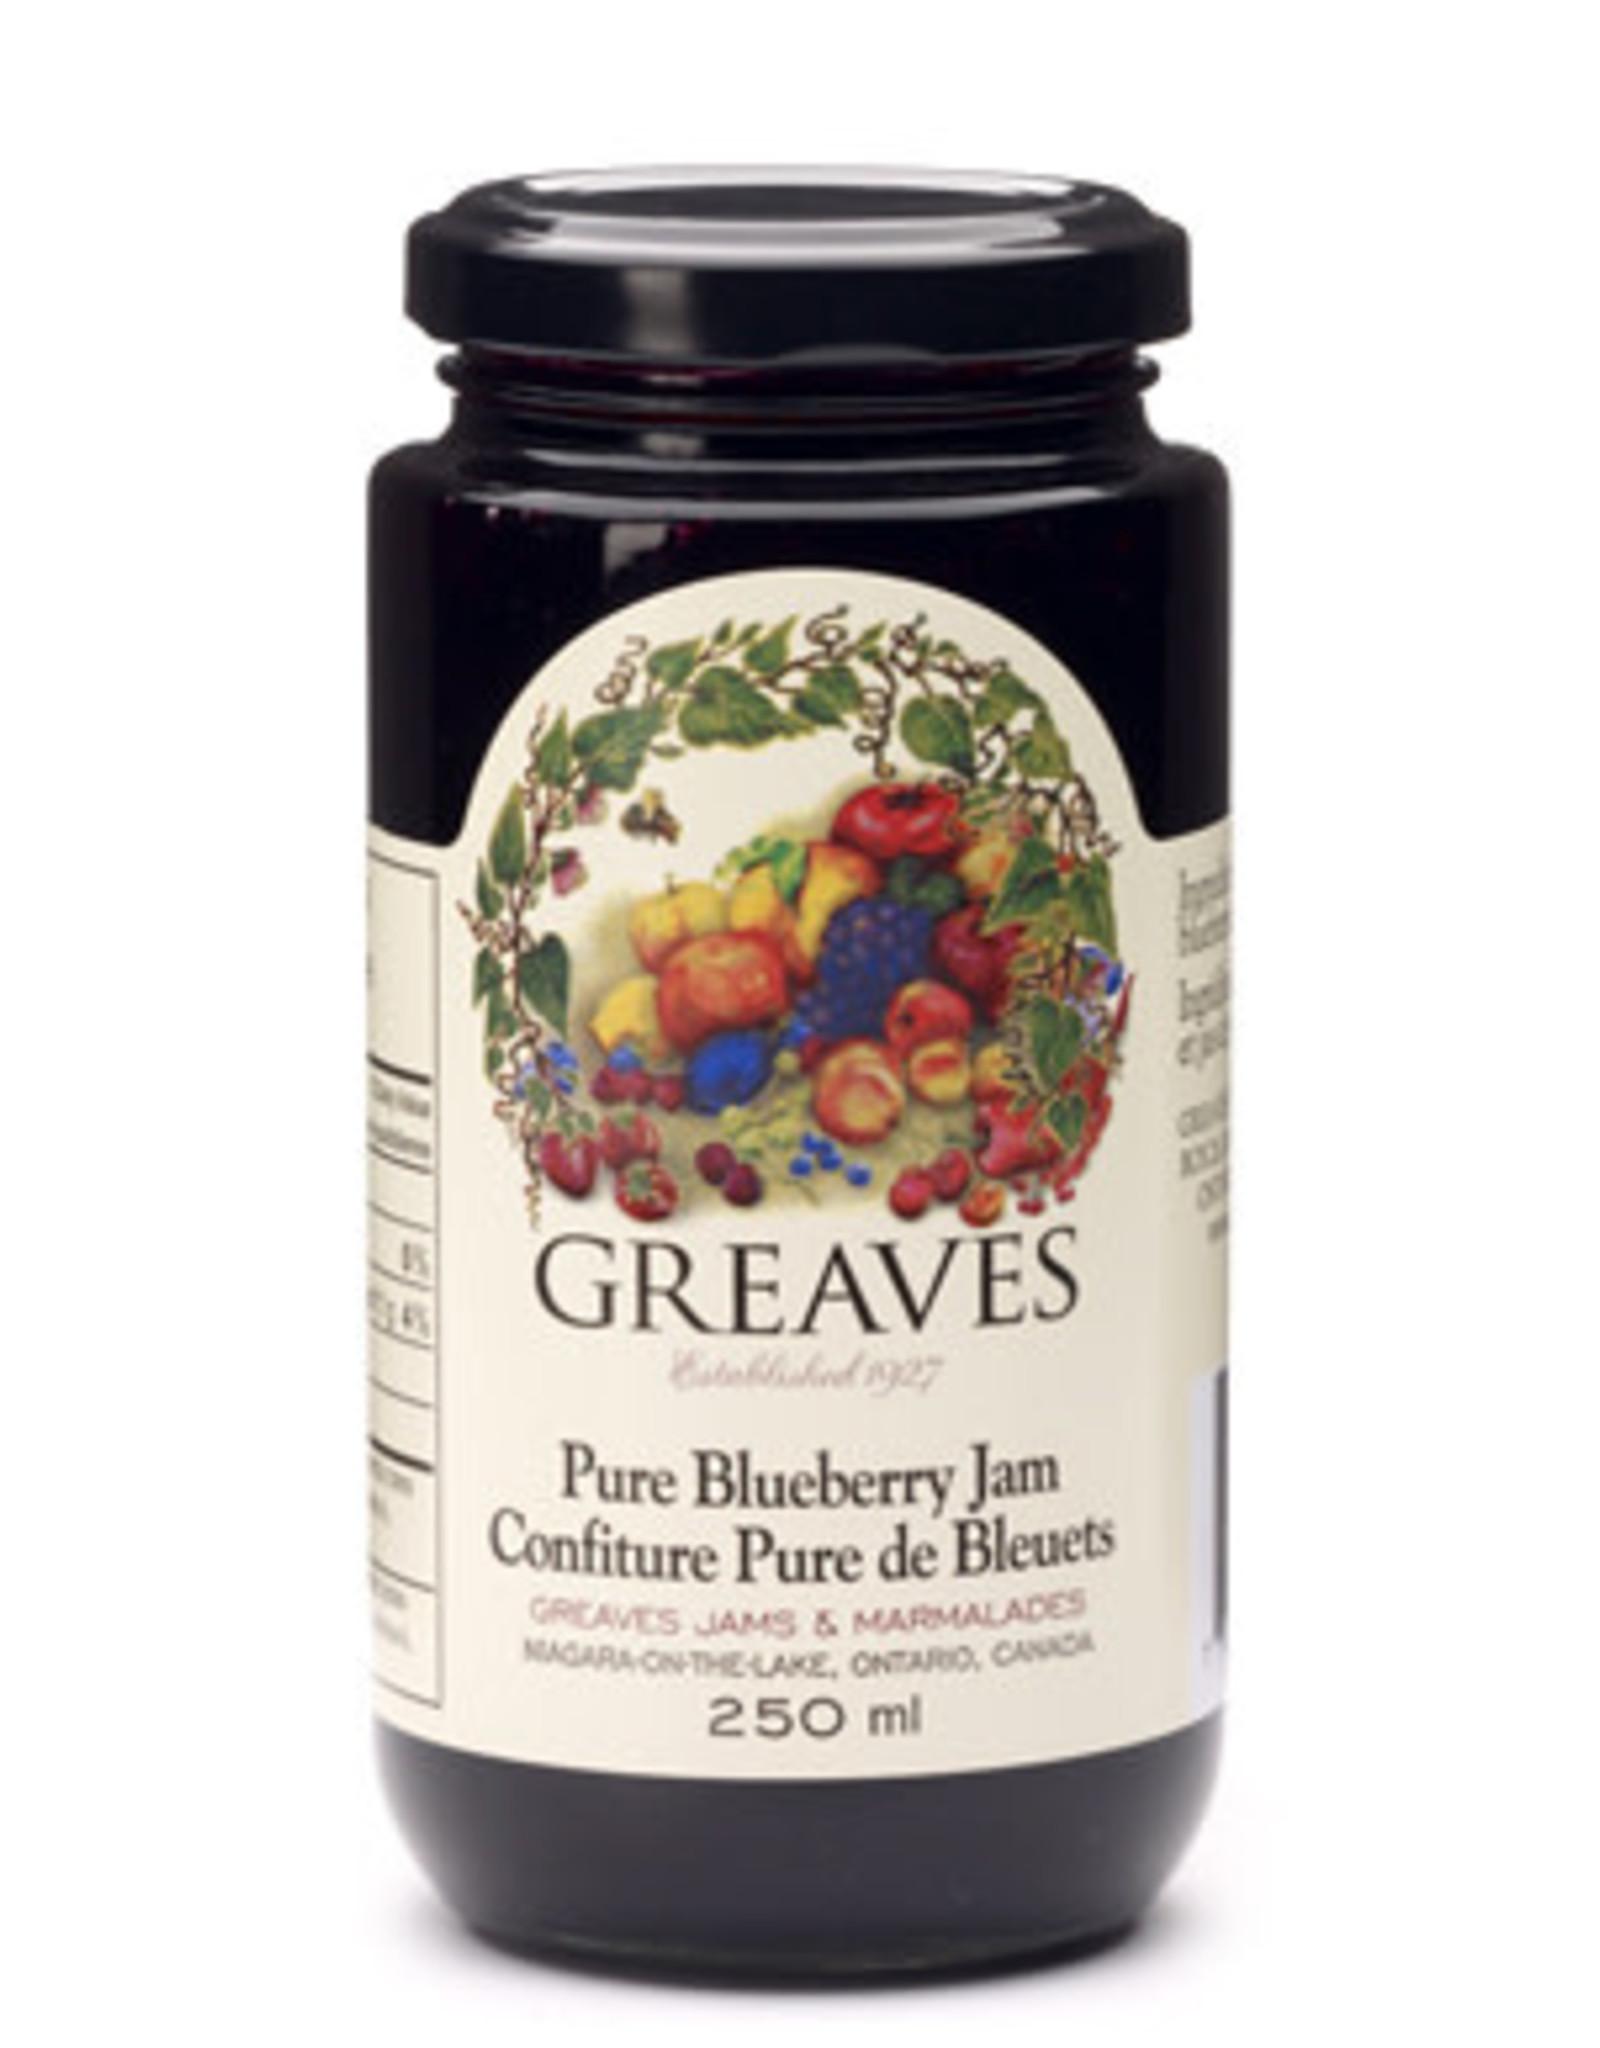 Greaves Jams & Marmalades Ltd. Greaves, Blueberry Jam, 250ml